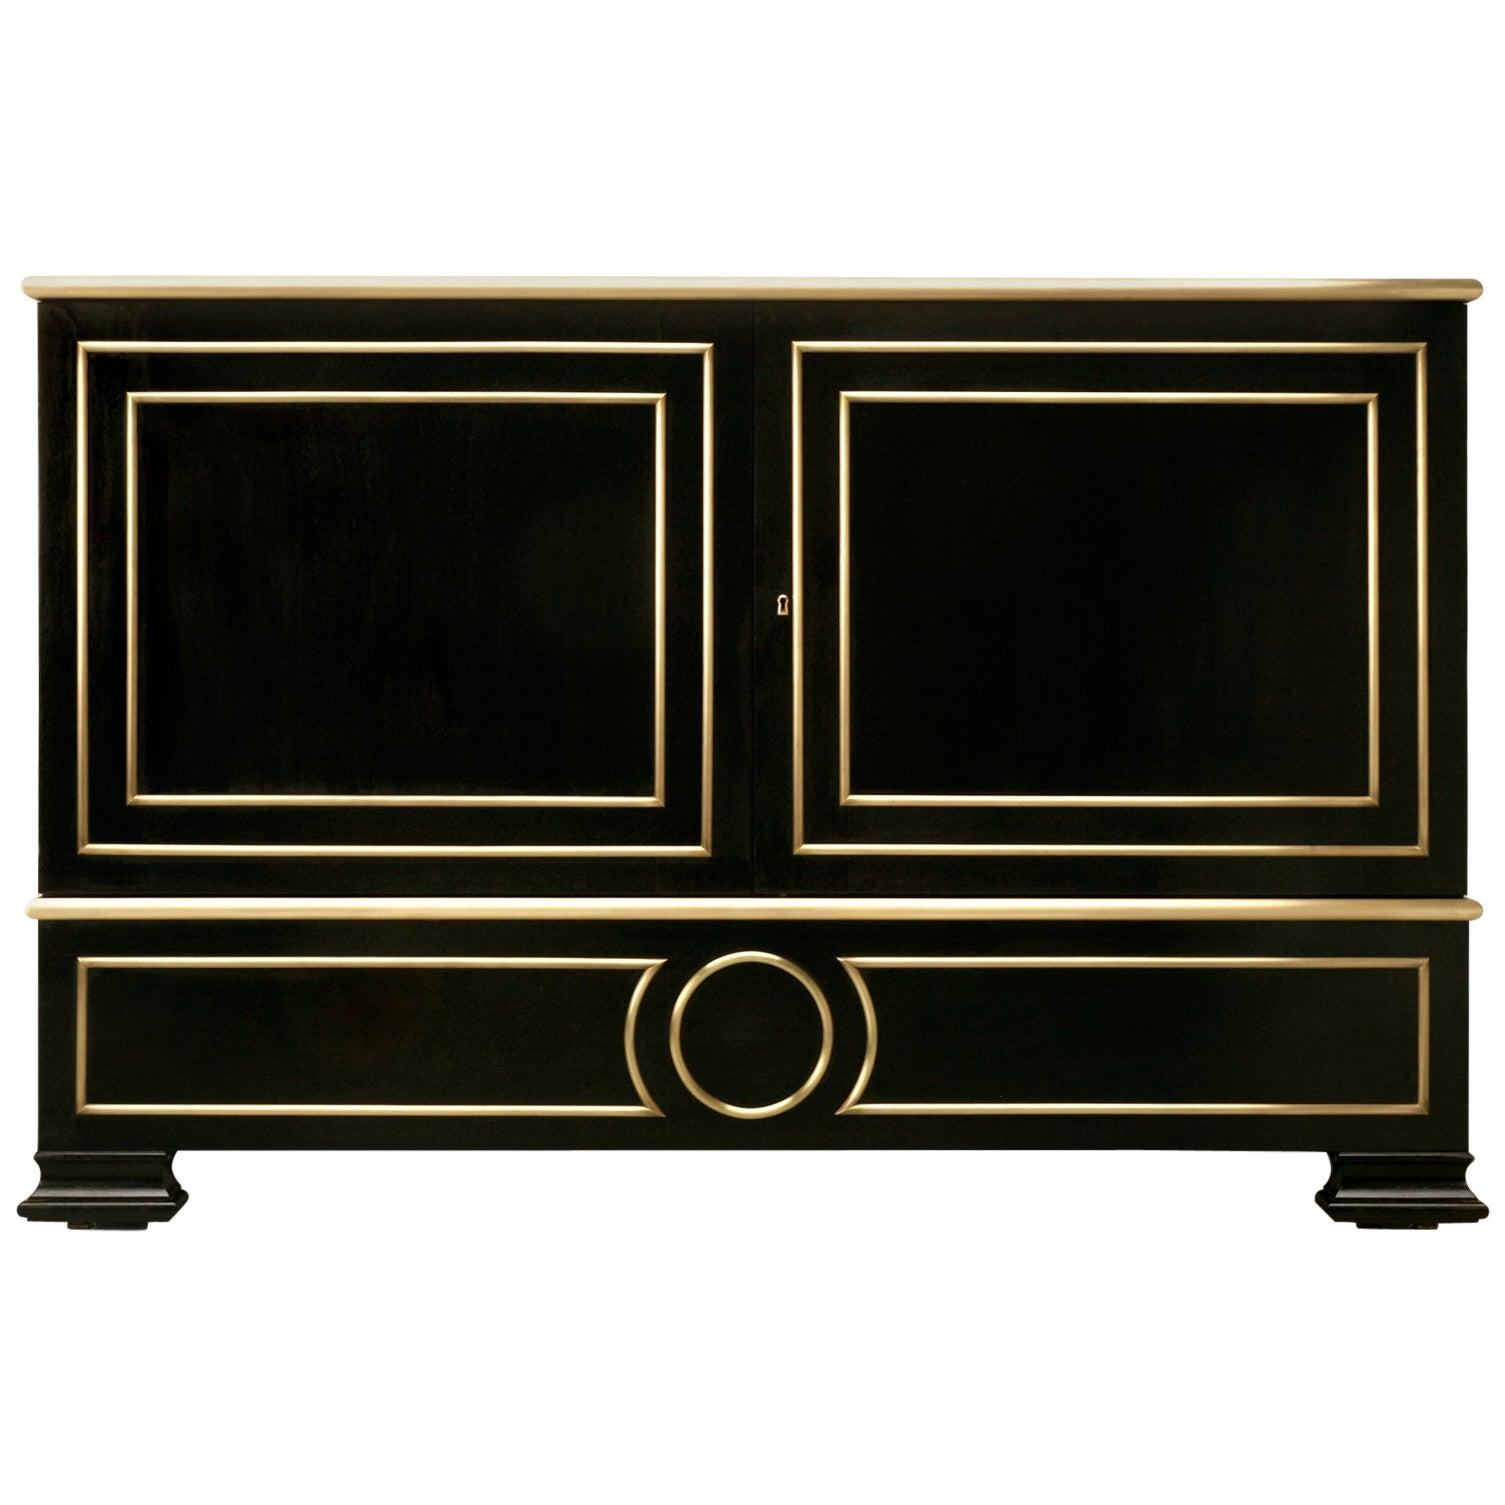 Ebonized Mahogany Directoire Style Buffet with Bronze Trim